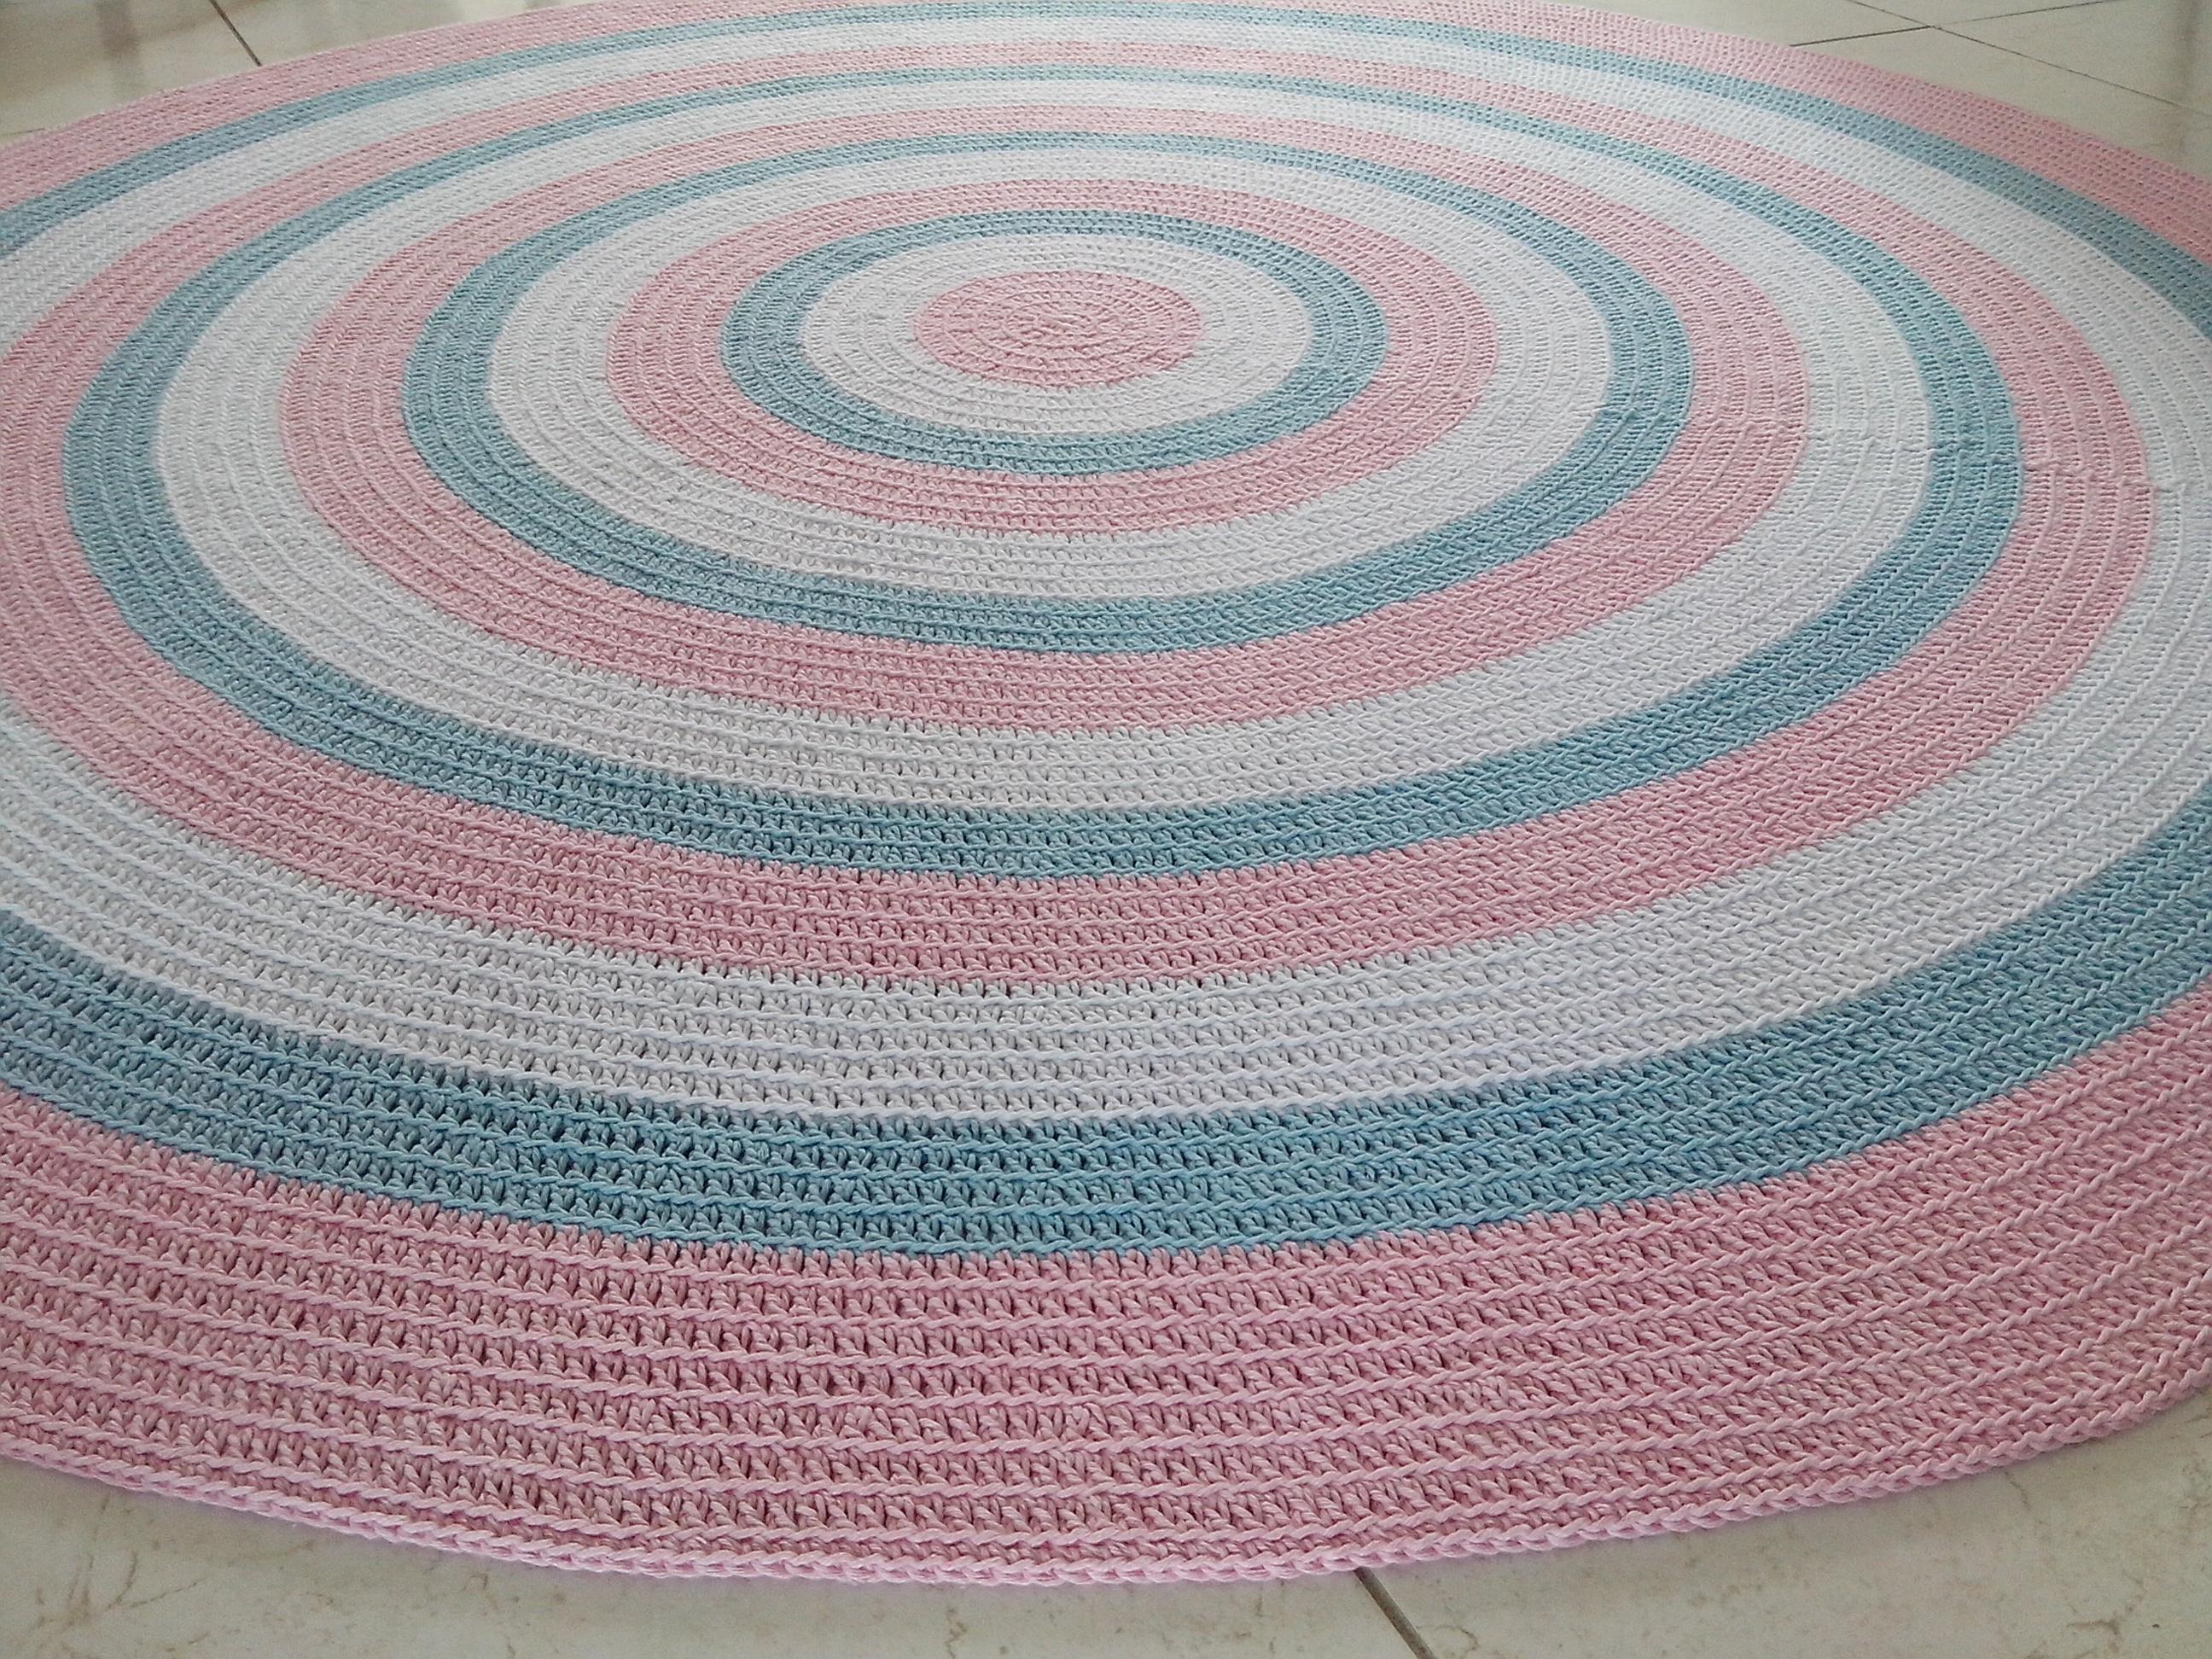 tapete croch baby meninas rosa 1 80m atelier val cordeiro elo7. Black Bedroom Furniture Sets. Home Design Ideas